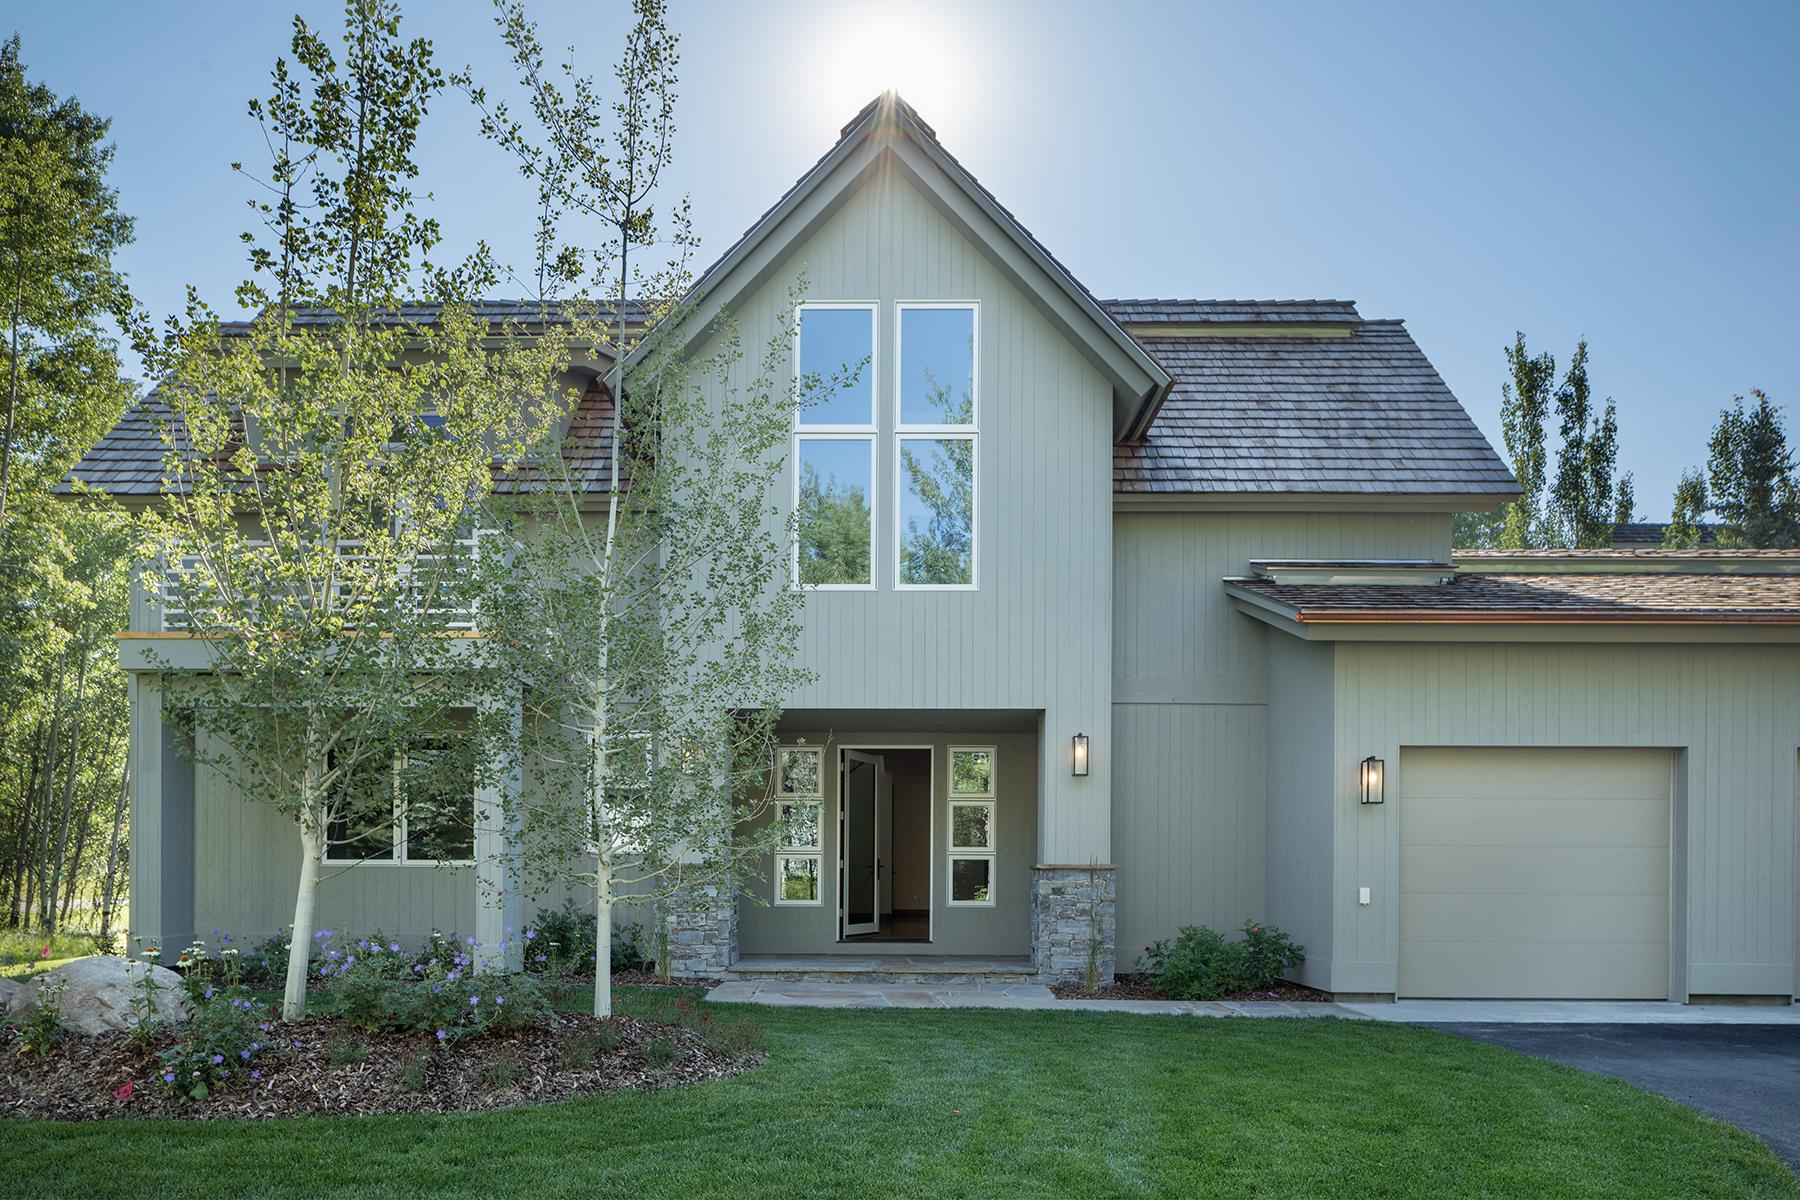 独户住宅 为 销售 在 Newly Constructed Cluster Home 2980 Aspen Wood Lane, 威尔逊, 怀俄明州, 83014 Jackson Hole, 美国